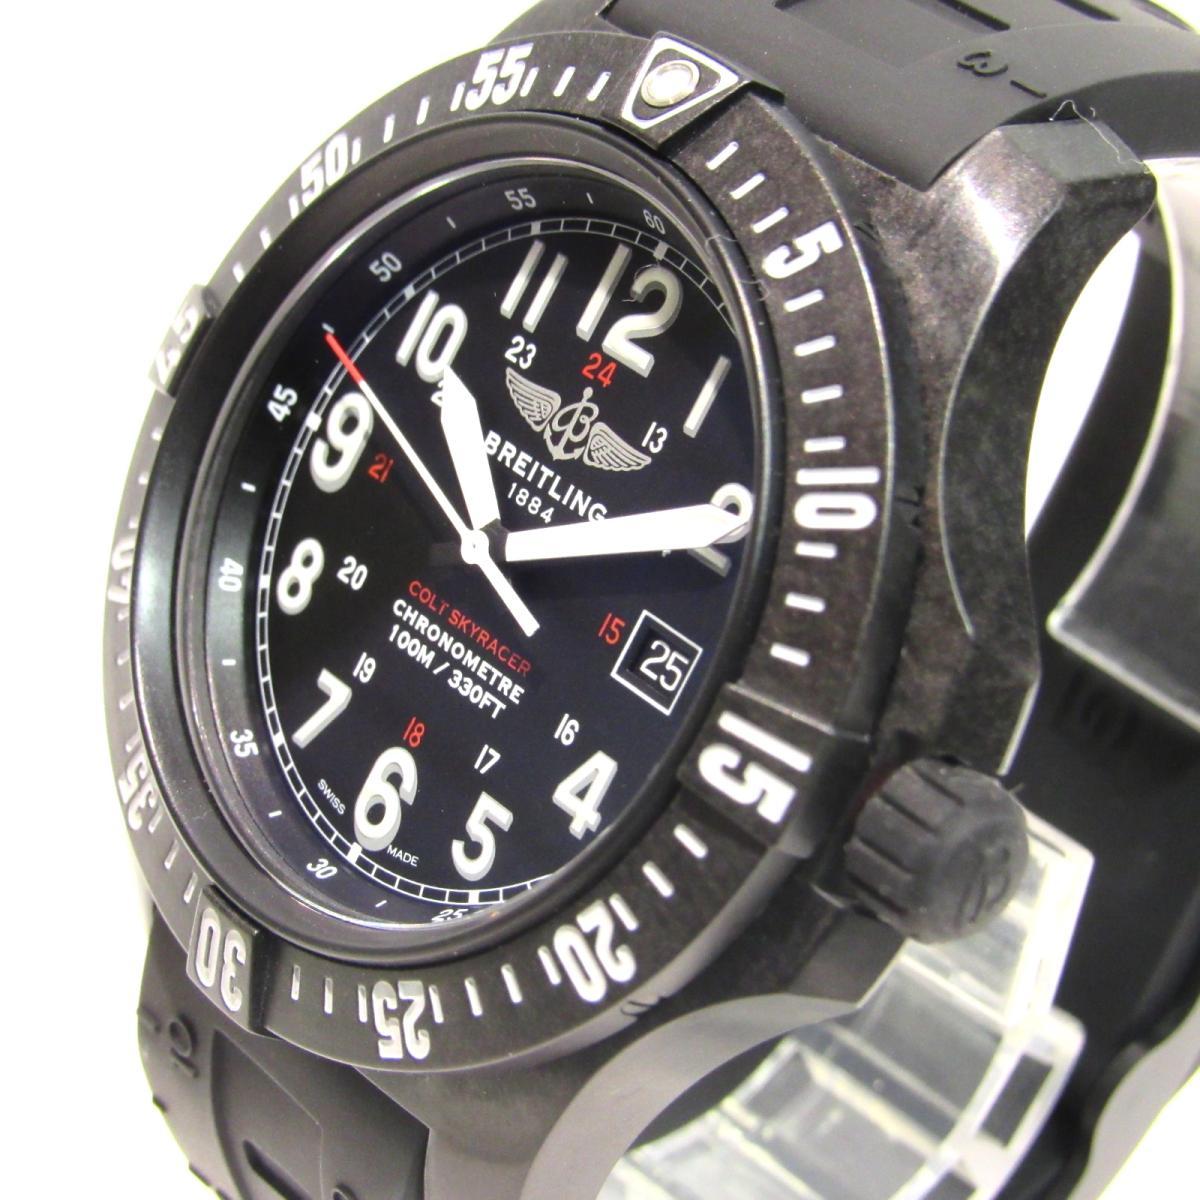 Auth Breitling Colt Sky Racer Watch X74320e4 Bf87 Quartz Bright Light Used Brandoff Ginza Tokyo Japan